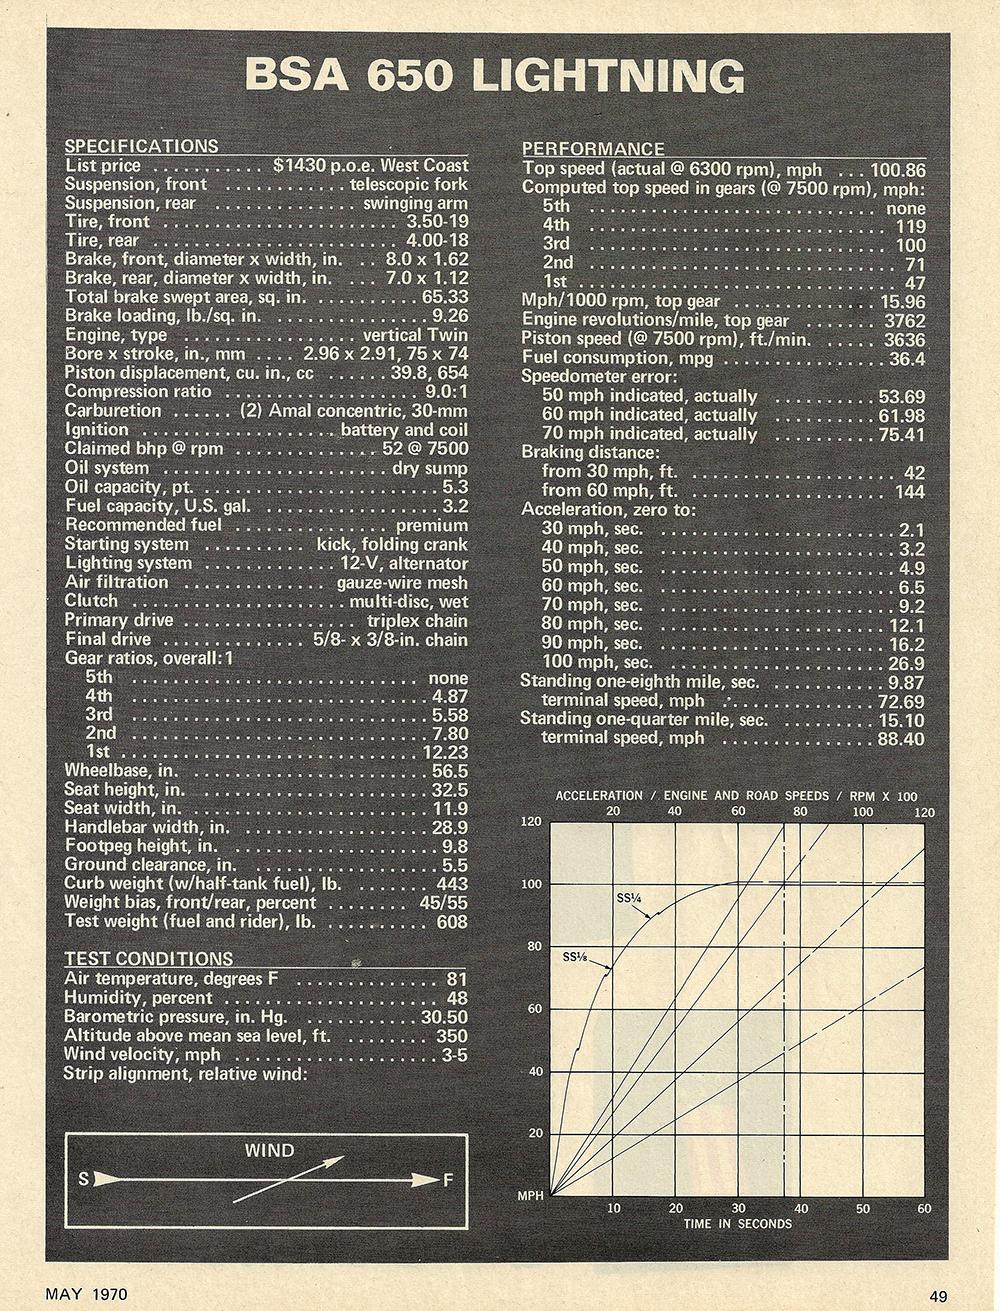 1970 BSA 650 Lightning road test 05.jpg